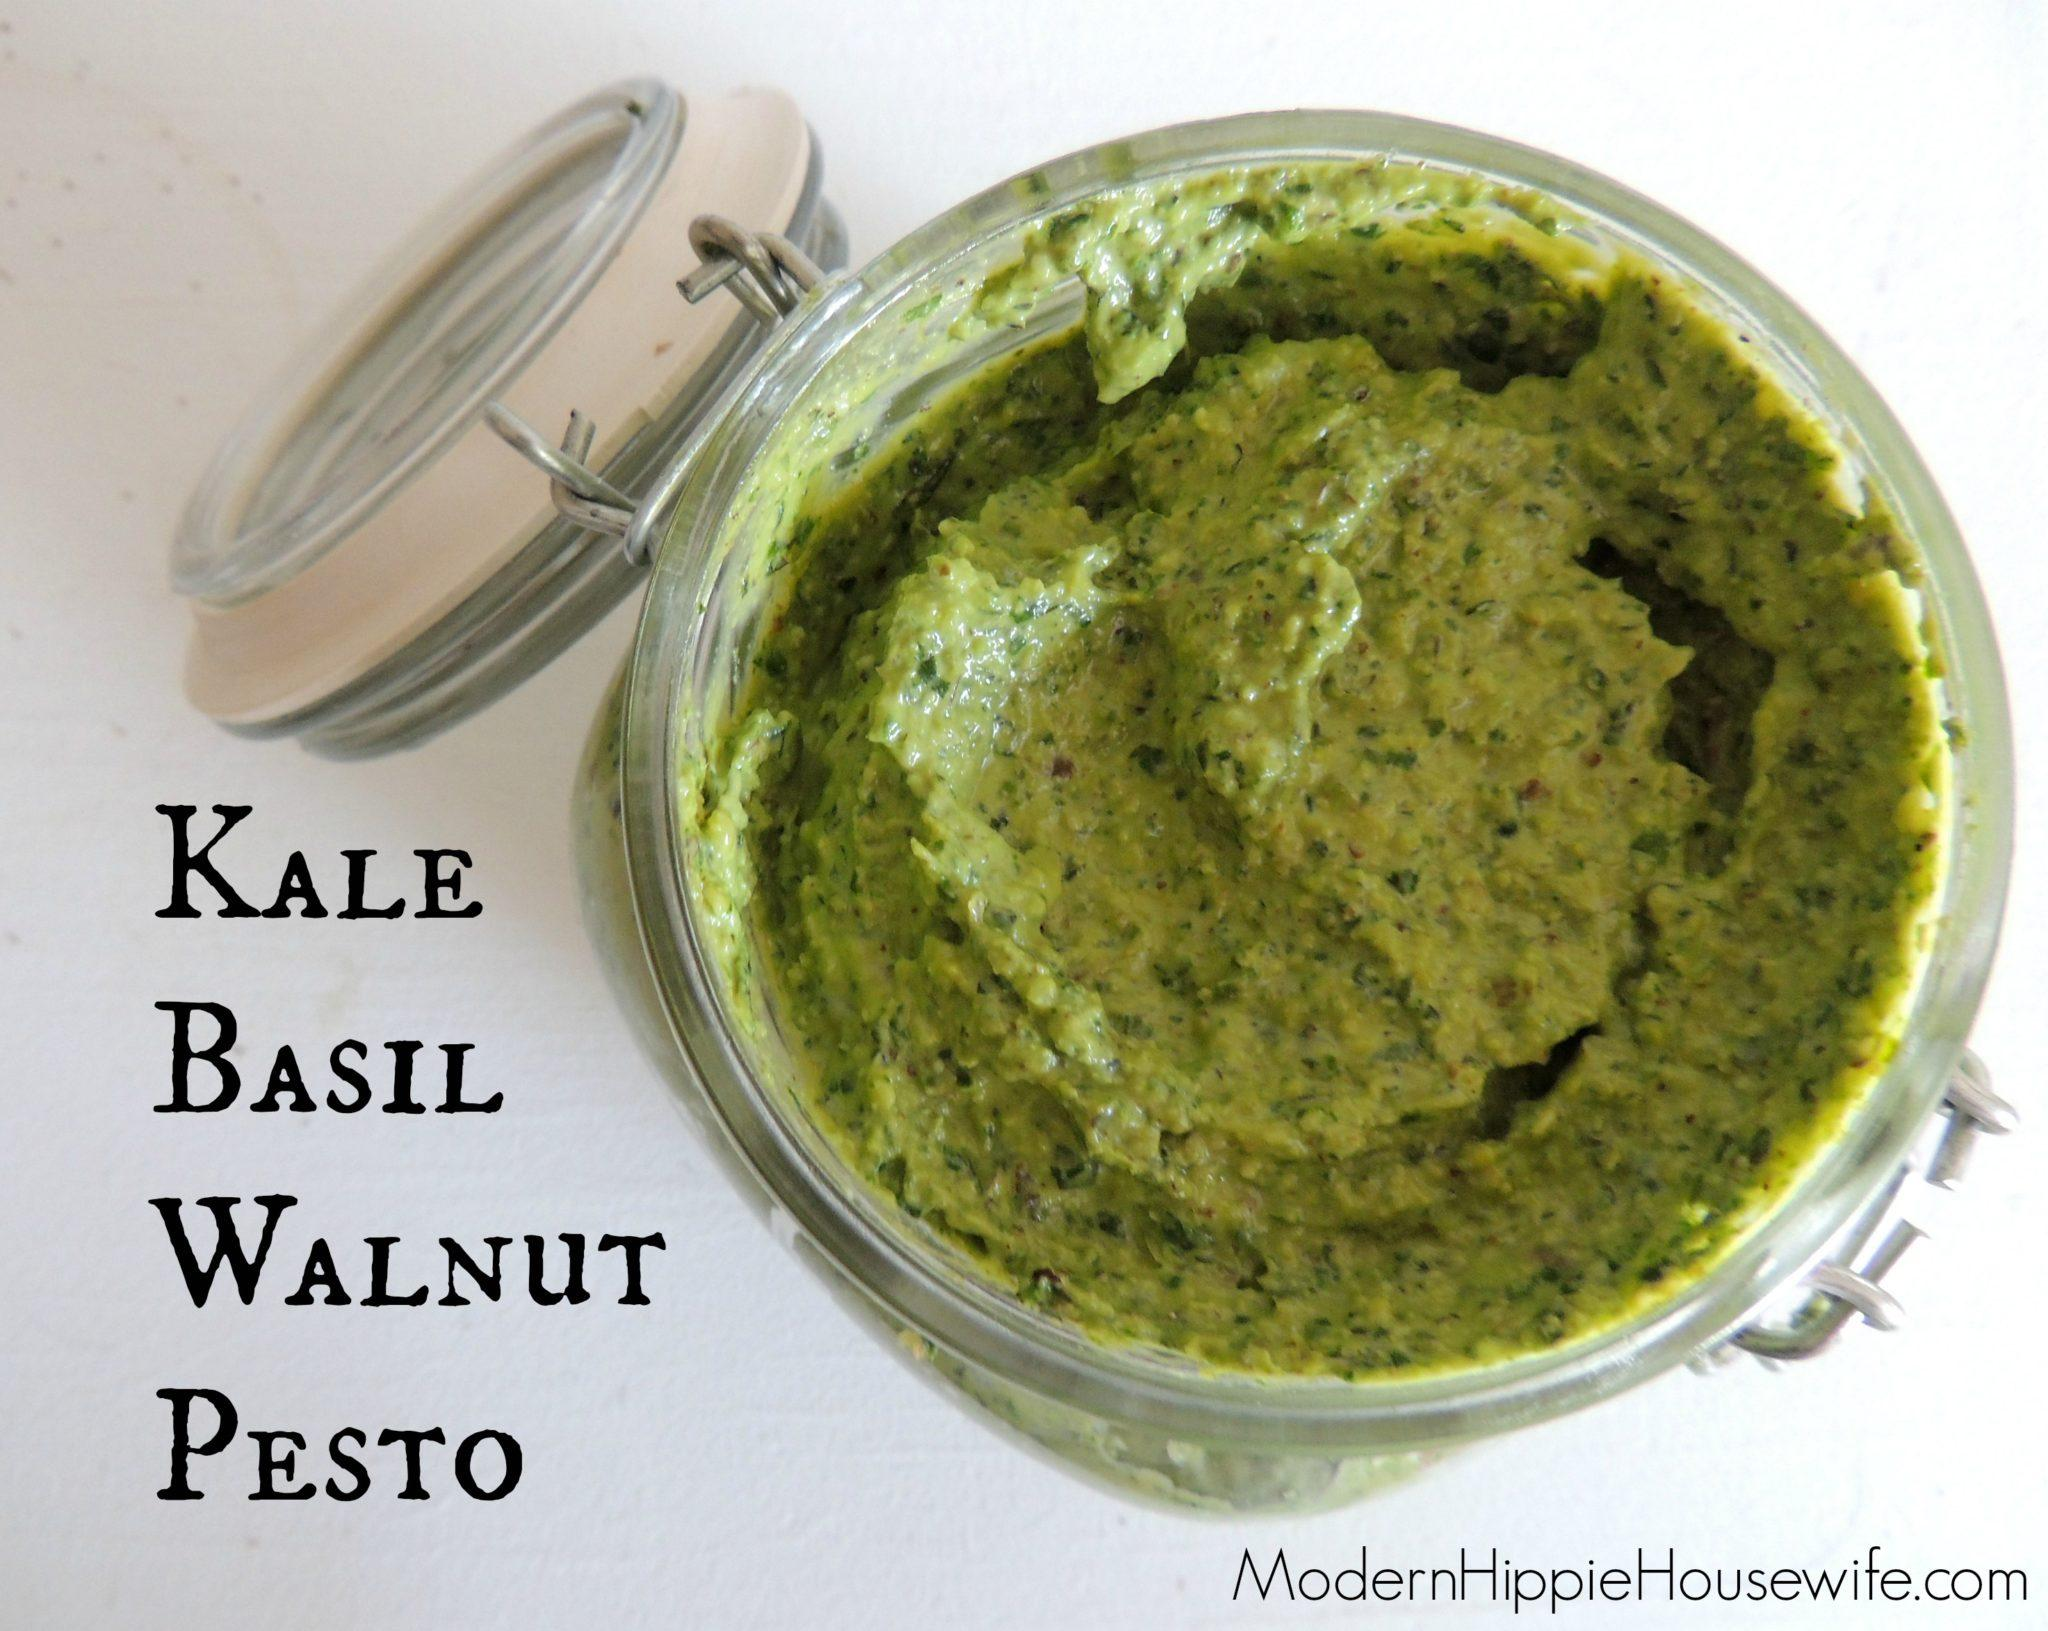 Kale Basil and Walnut Pesto